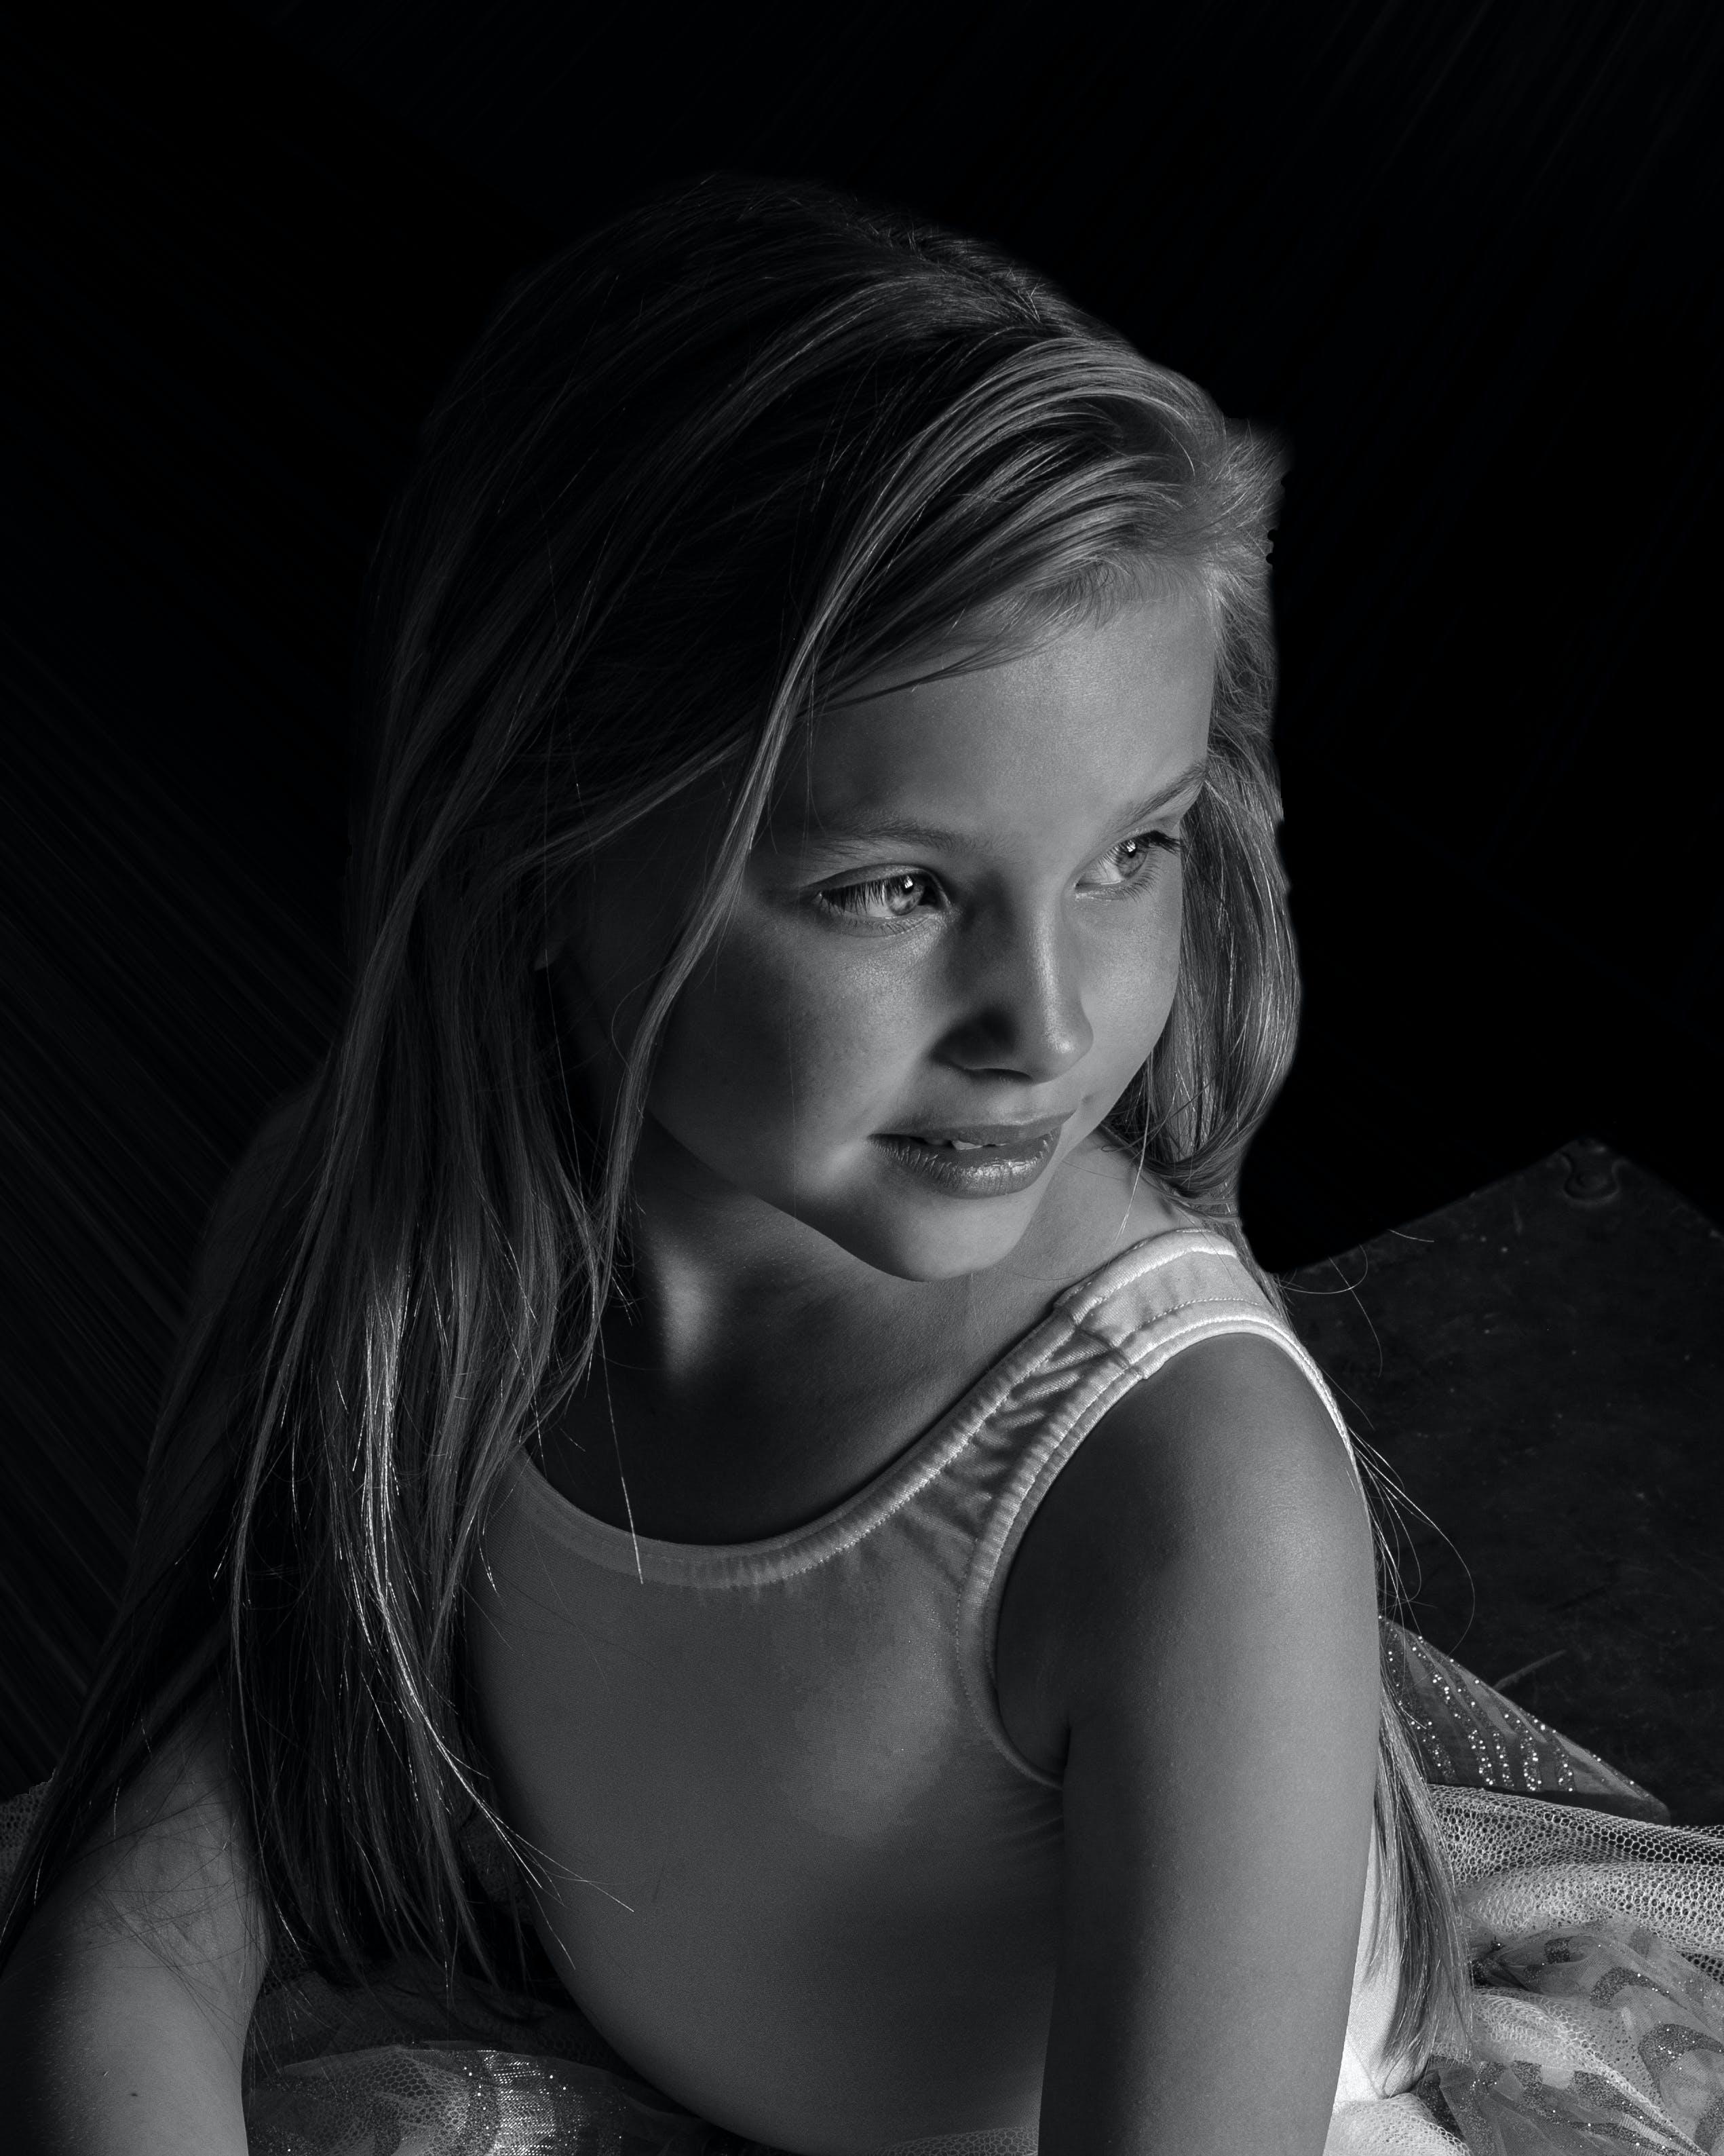 Grayscale Photo of Girl Wearing Leotard